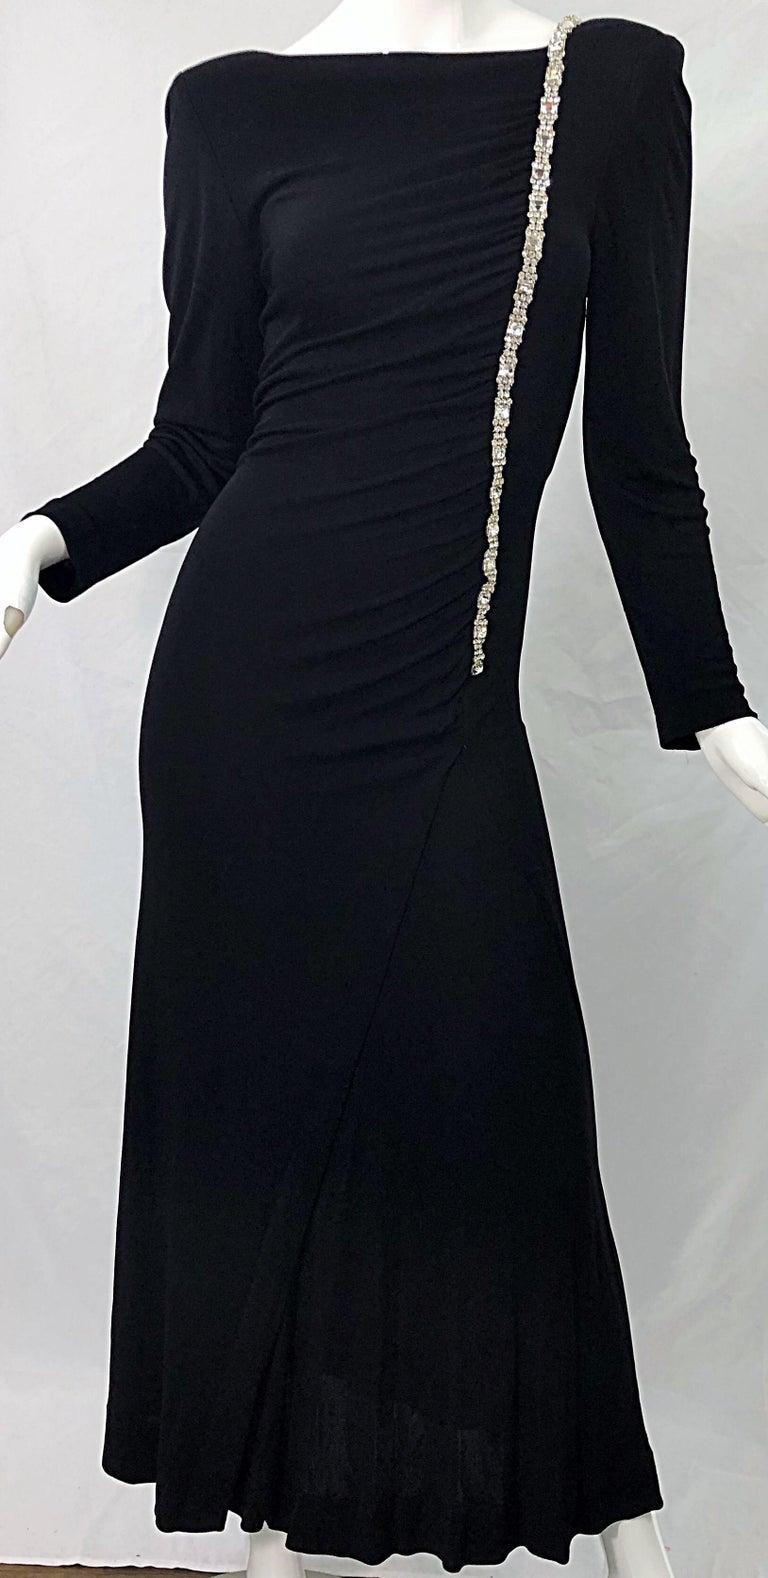 1980s Travilla Size 10 Black Matte Silk Jersey Rhinestone Vintage 80s Gown Dress For Sale 4